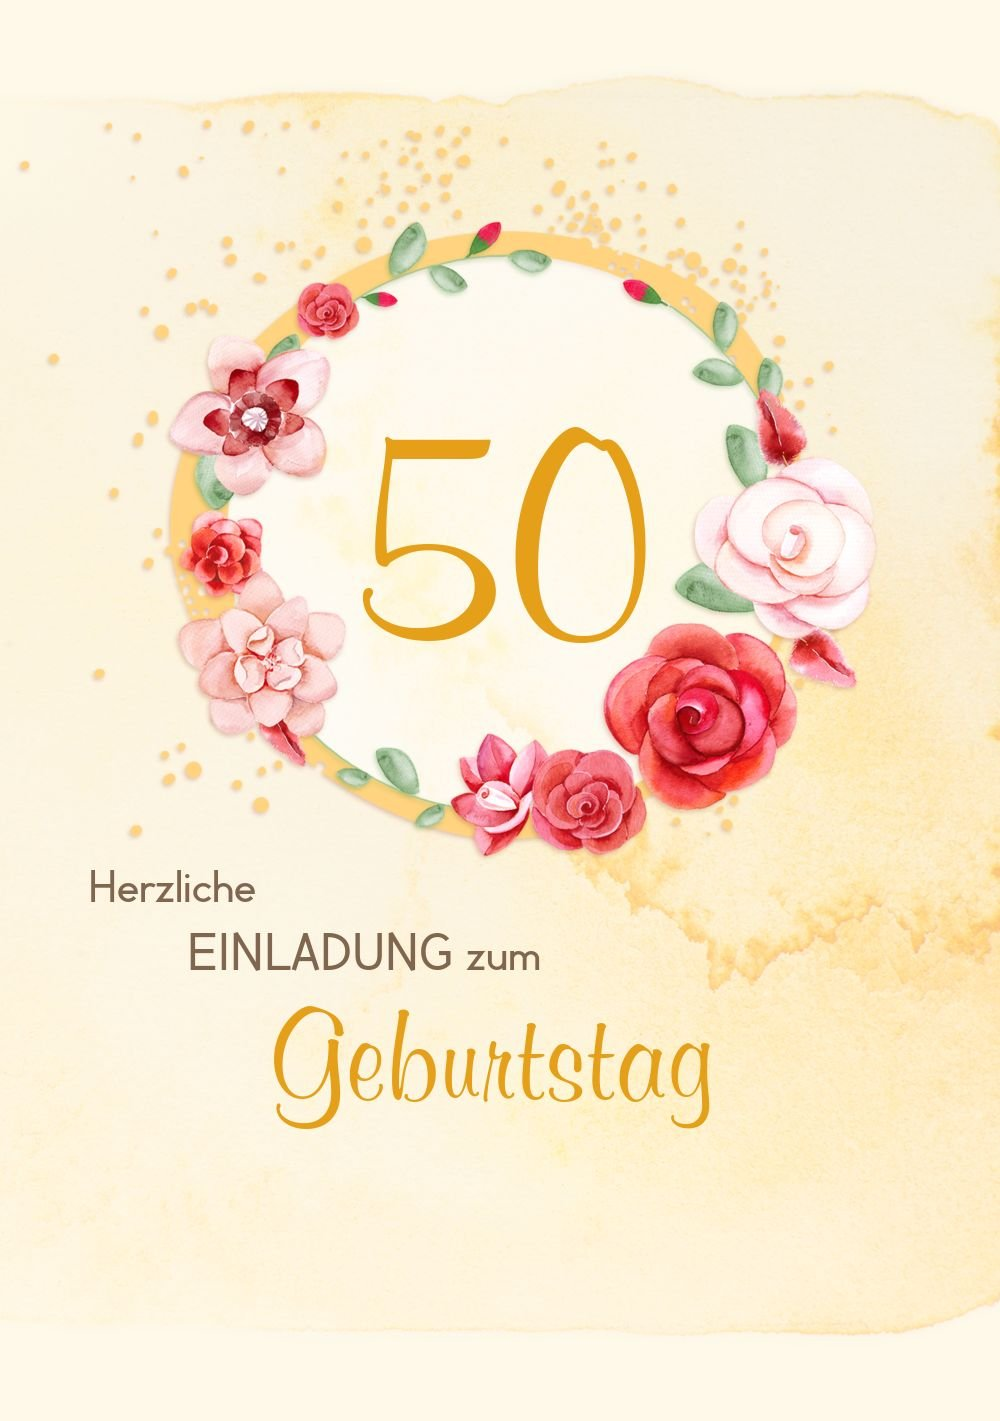 Geburtstagseinladung Aquarell Rosan 50 50 50 Foto, 20 Karten, RosaRosa B073D2XDPB | Billig ideal  | Nutzen Sie Materialien voll aus  | Export  76f51d